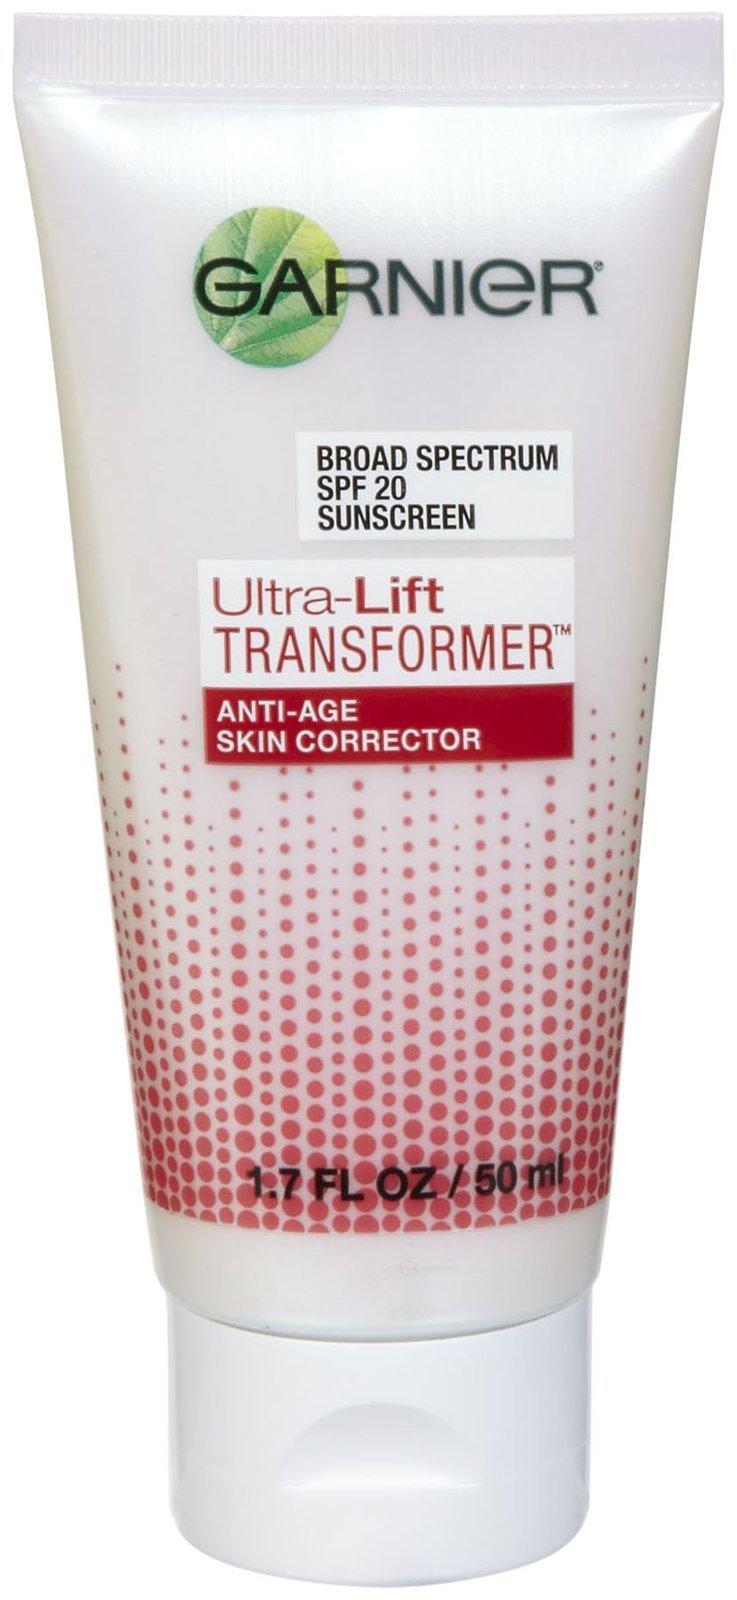 Garnier Ultra-Lift Transformer Anti-Age Skin Corrector for All Skin Tones, 1.7 Fl Oz